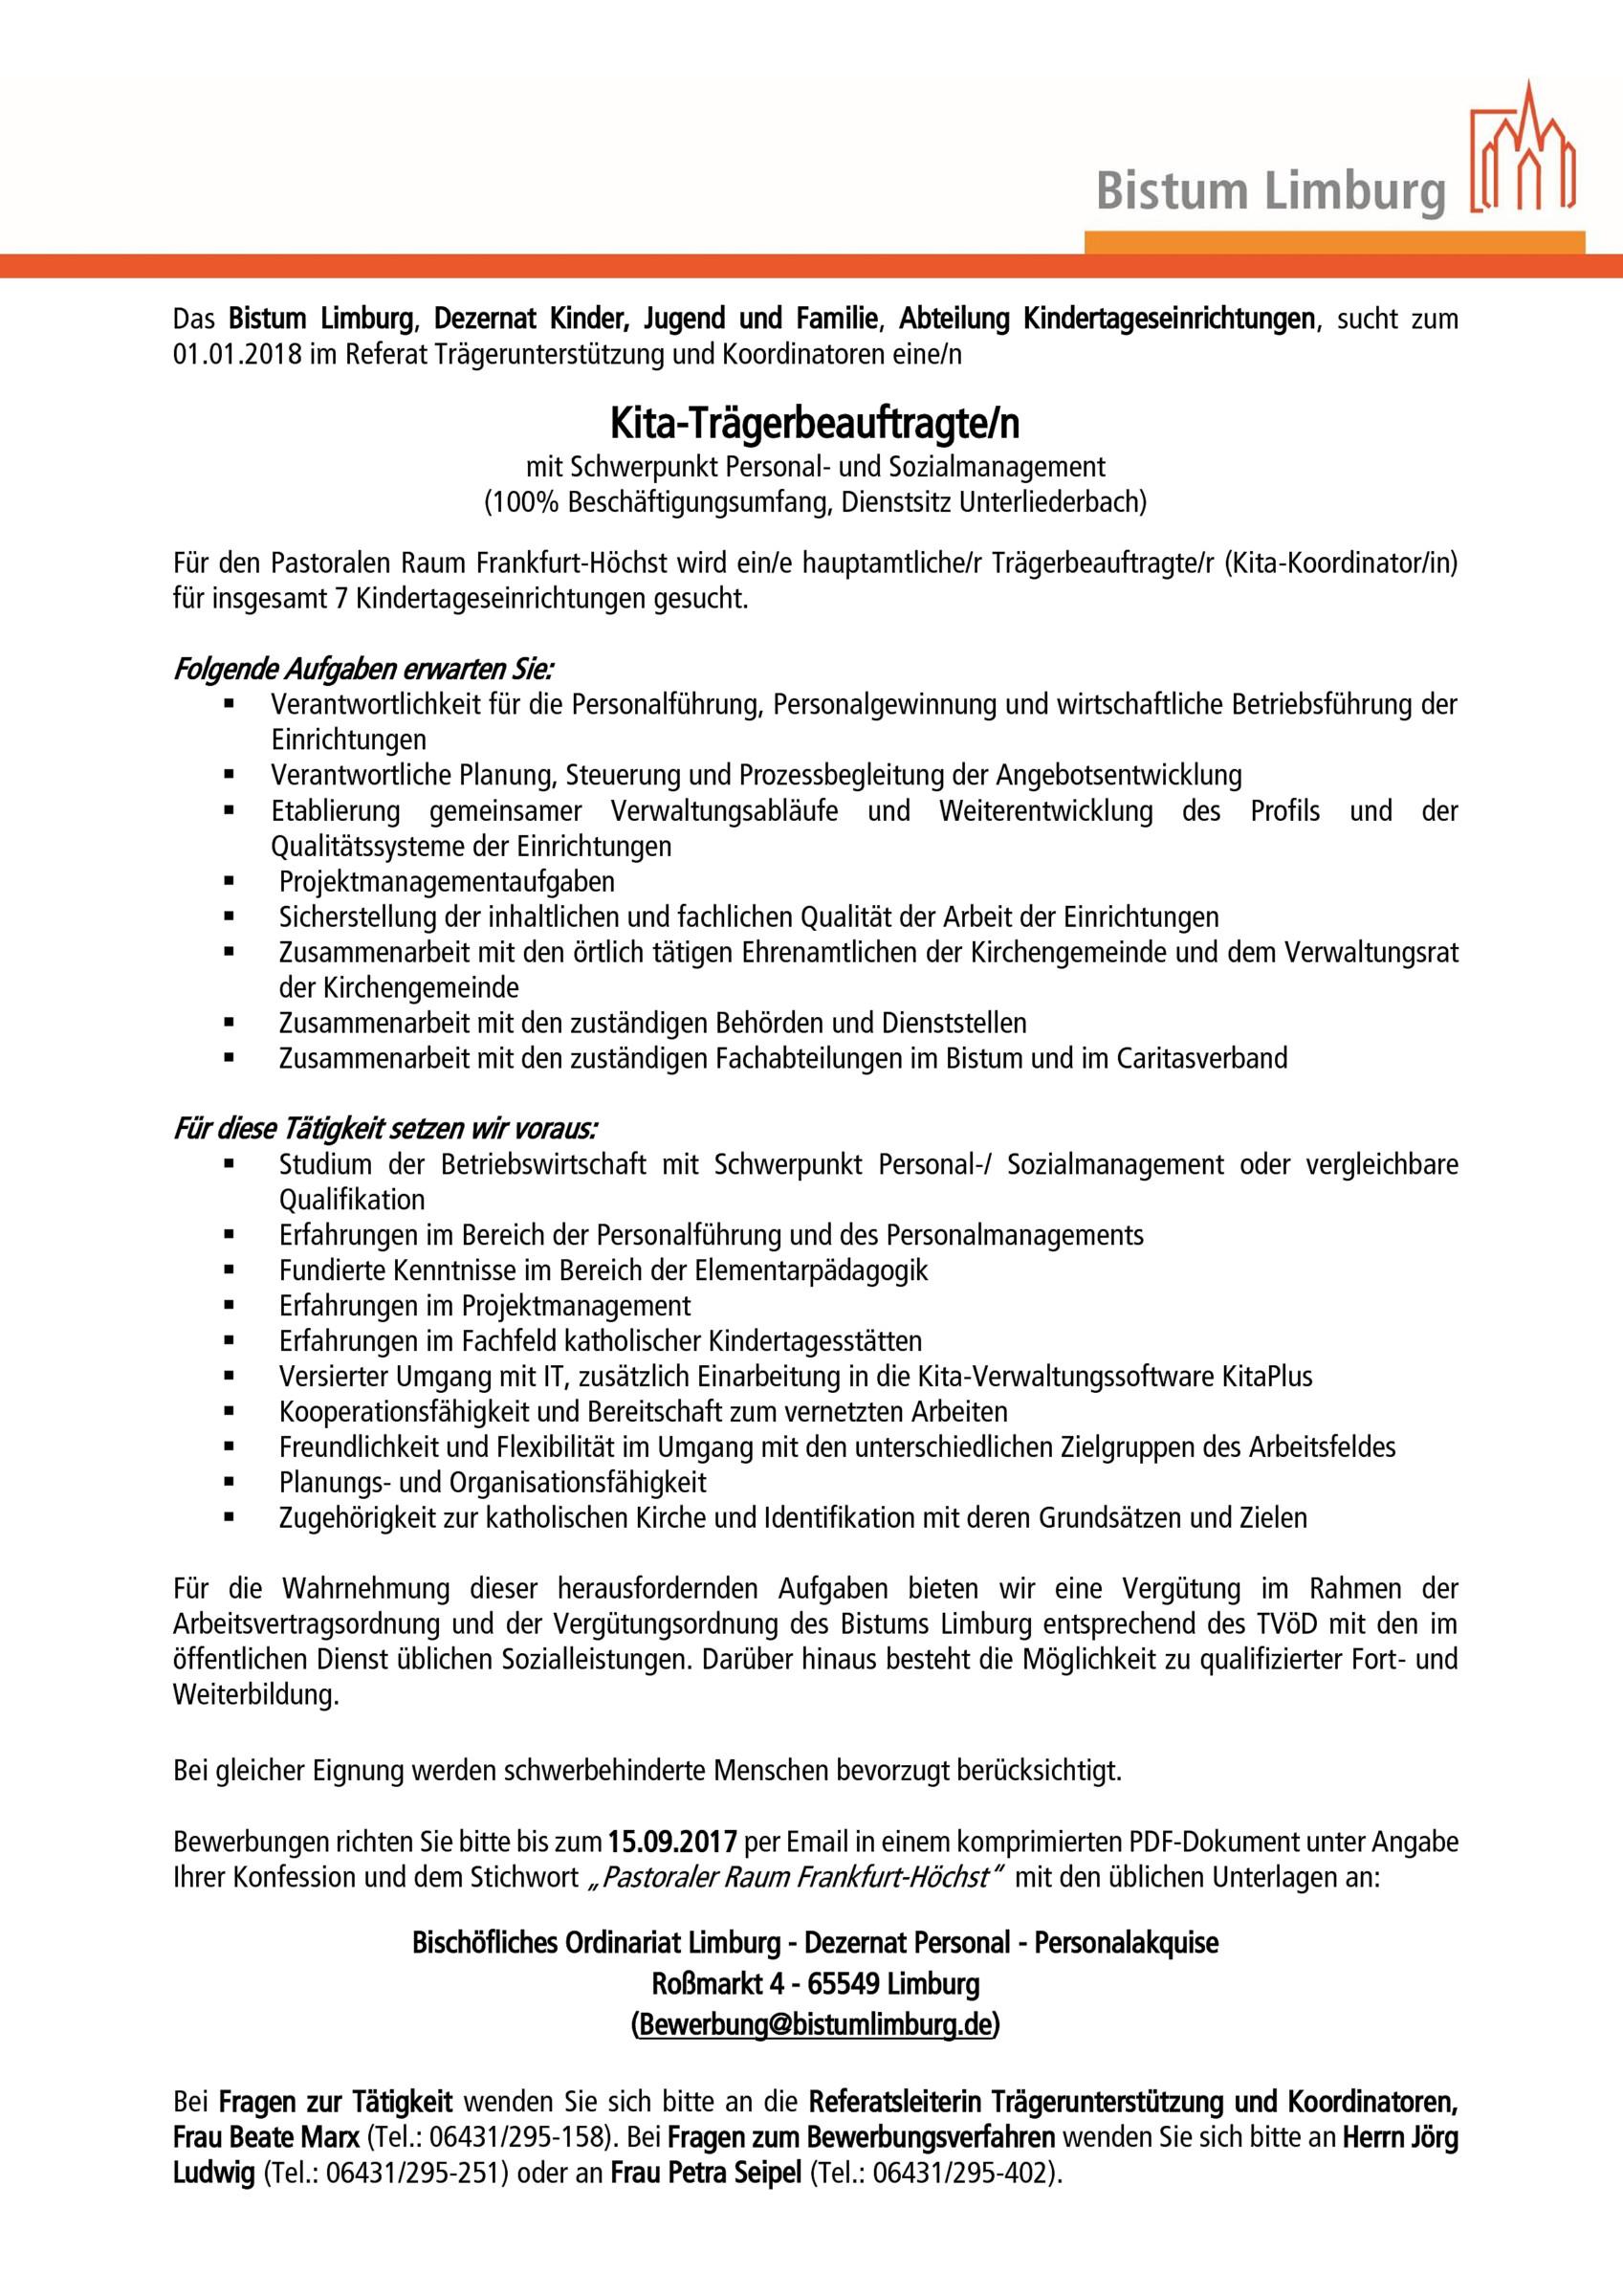 20170814_Kita-TraegerbeauftragteR_Pastoraler_Raum_Hoechst